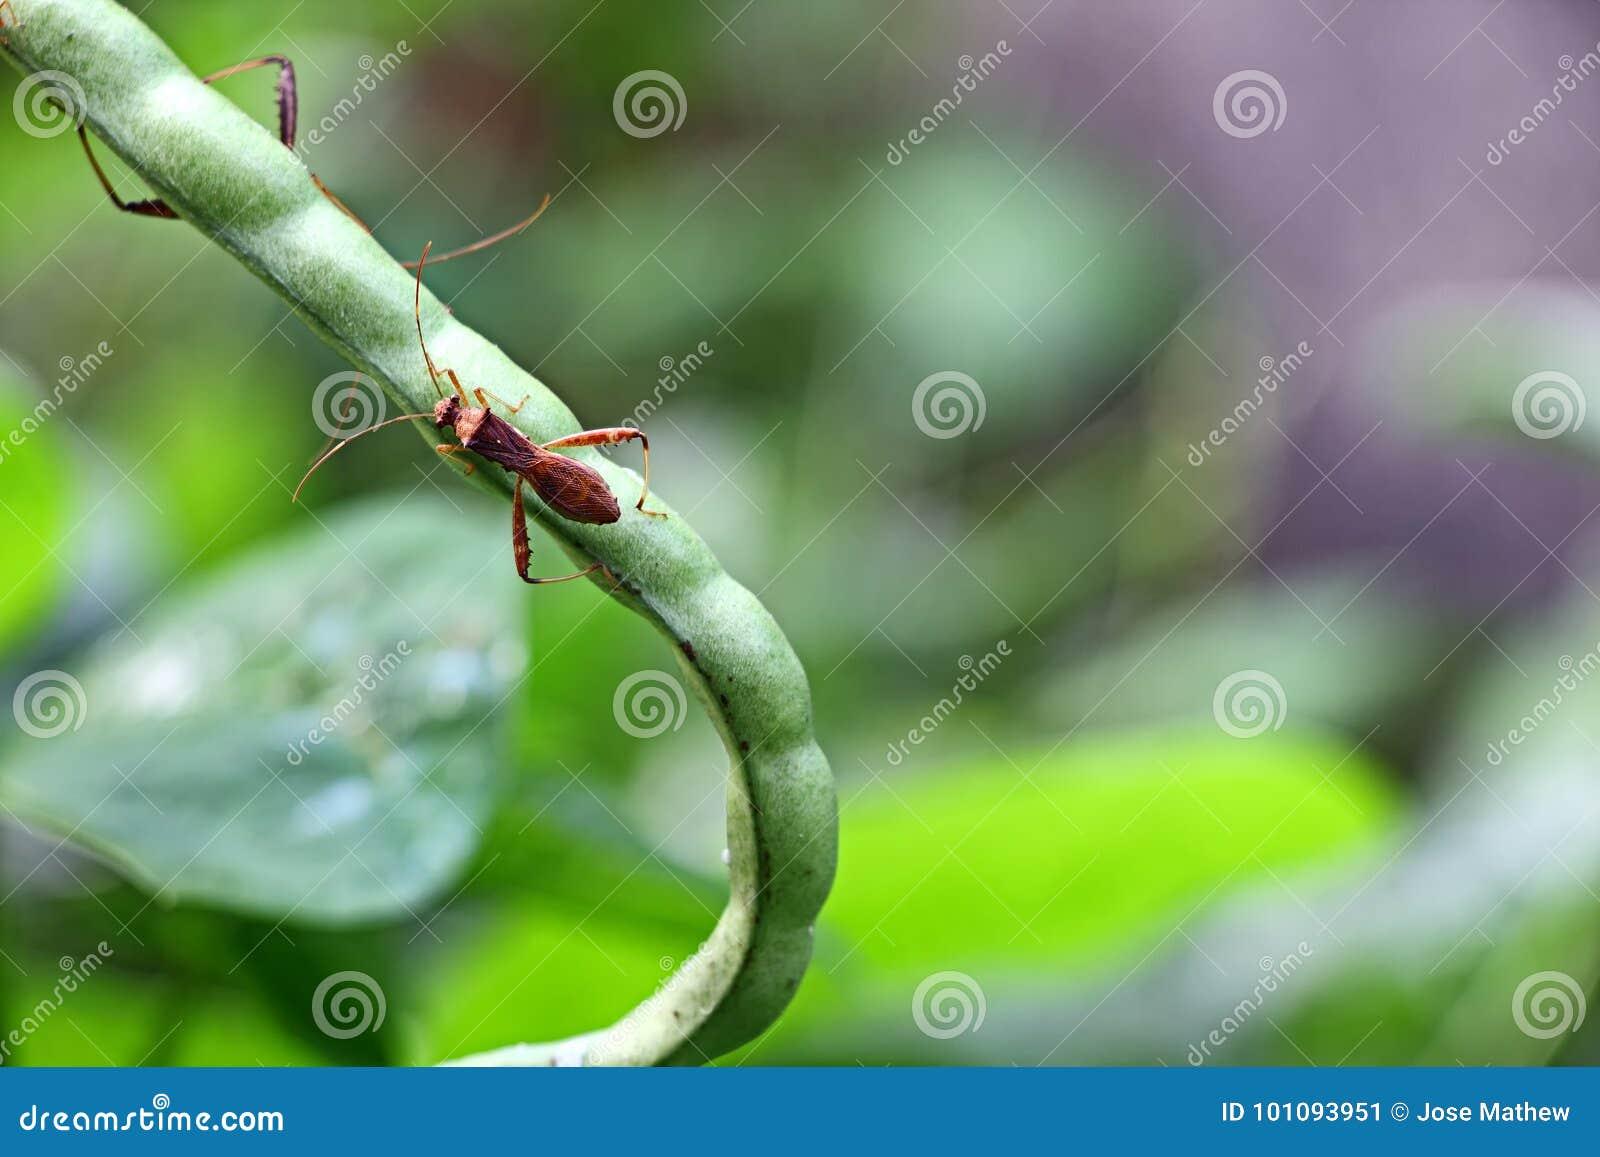 Тип цветка фиалка